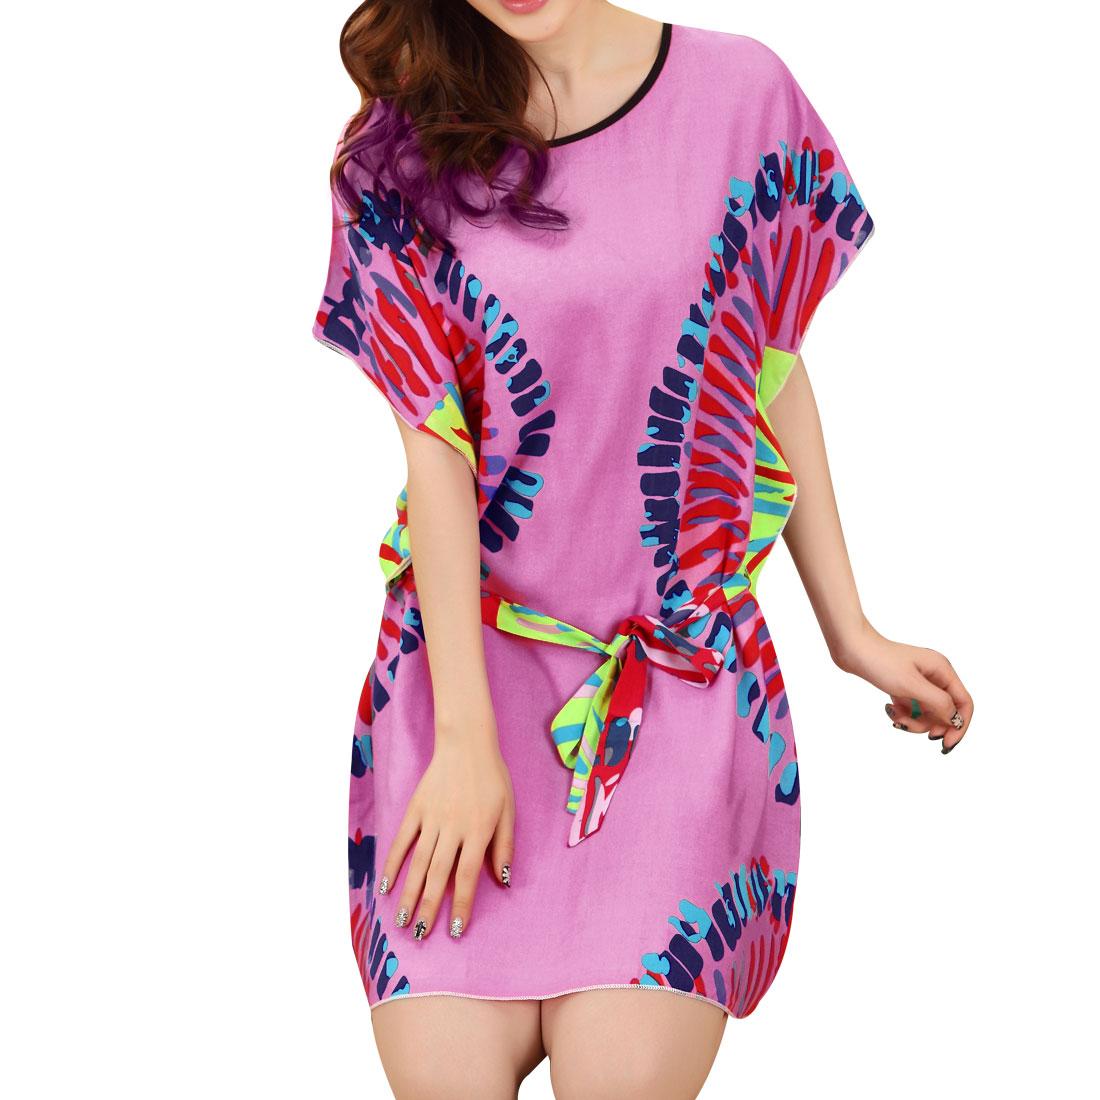 Ladies Stripes Pattern Round Neck Adjustable Strap Sleep Dress Pink S